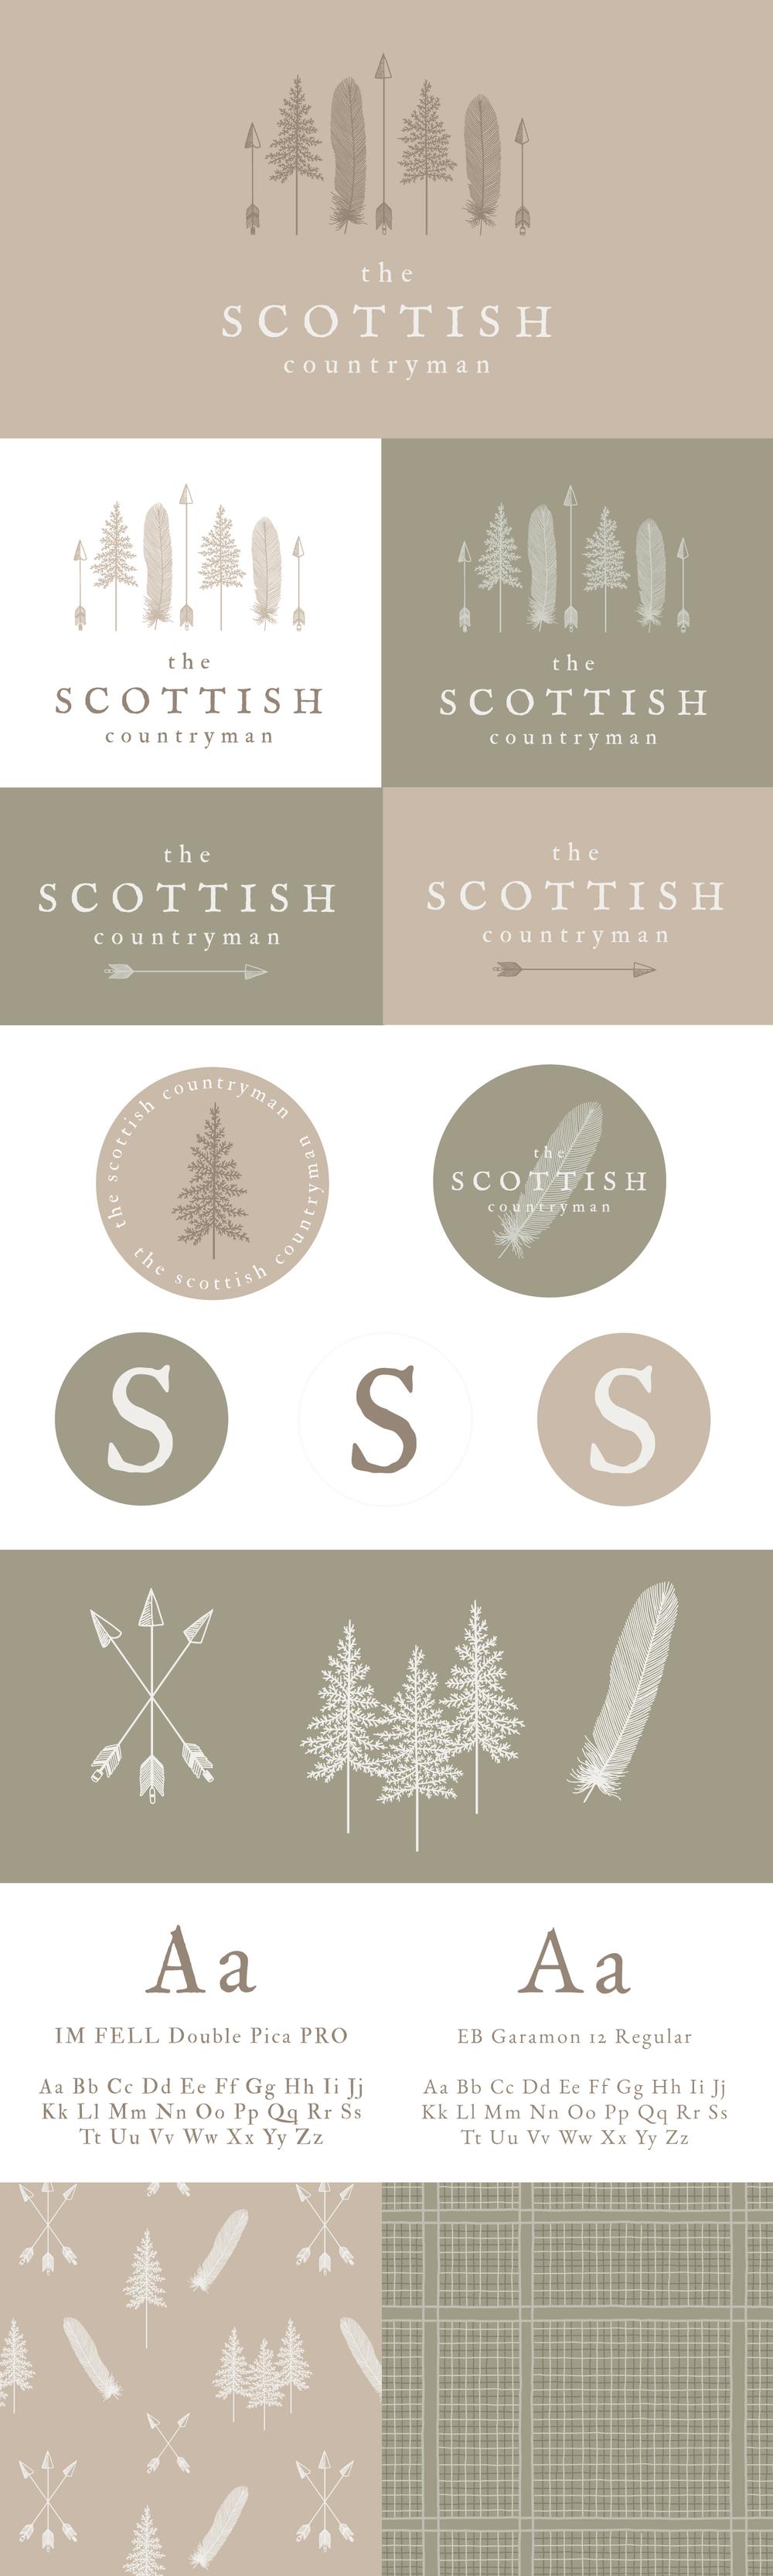 The Scottish Countryman - Logo & Branding by Bea & Bloom Creative Design Studio